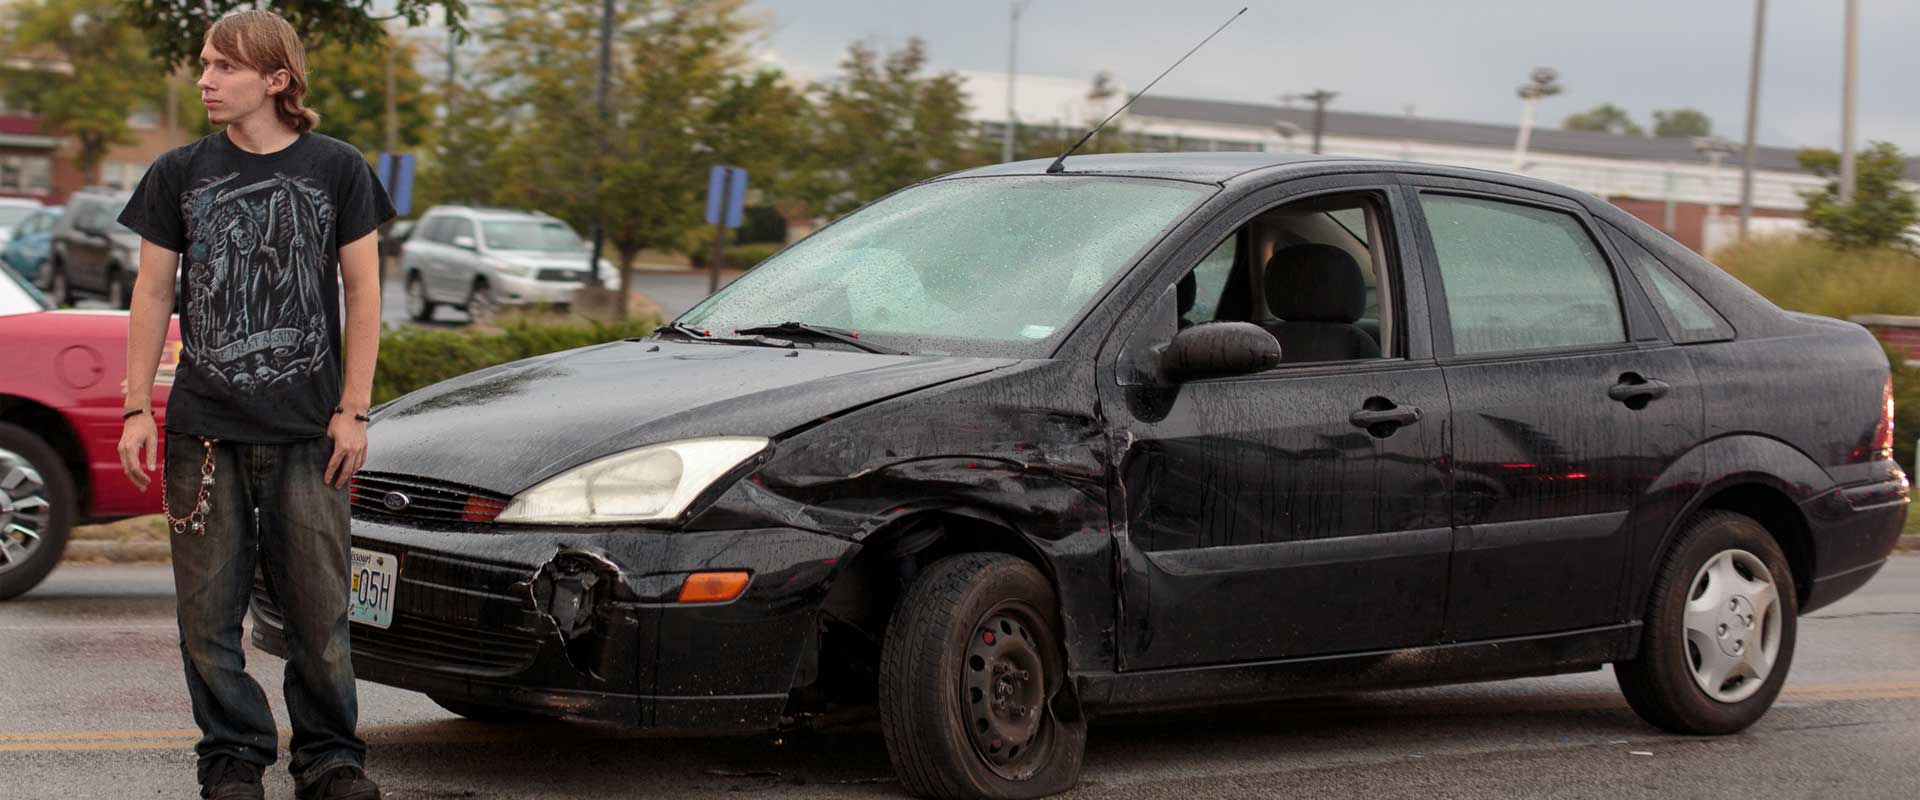 collect scrap car for cash